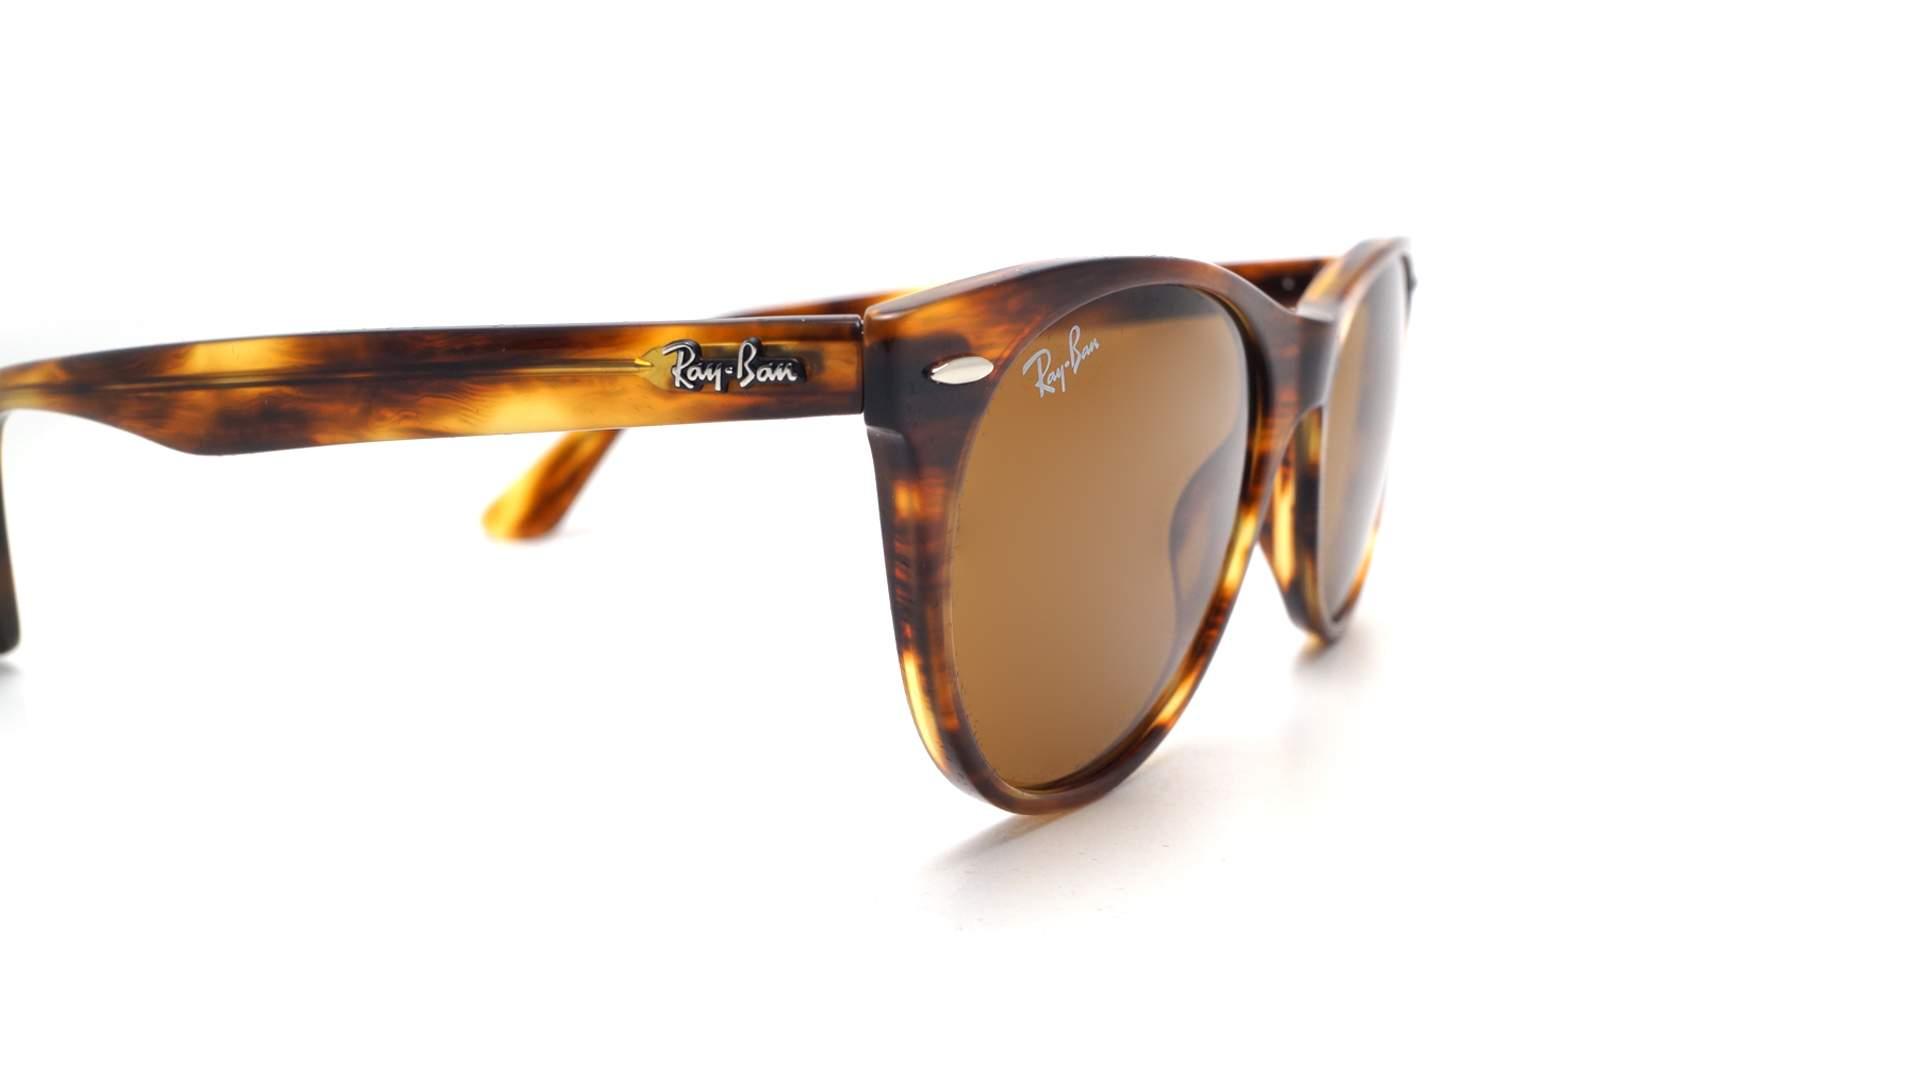 2d52da001 Sunglasses Ray-Ban Wayfarer II Classic Tortoise RB2185 954/33 52-18 Medium